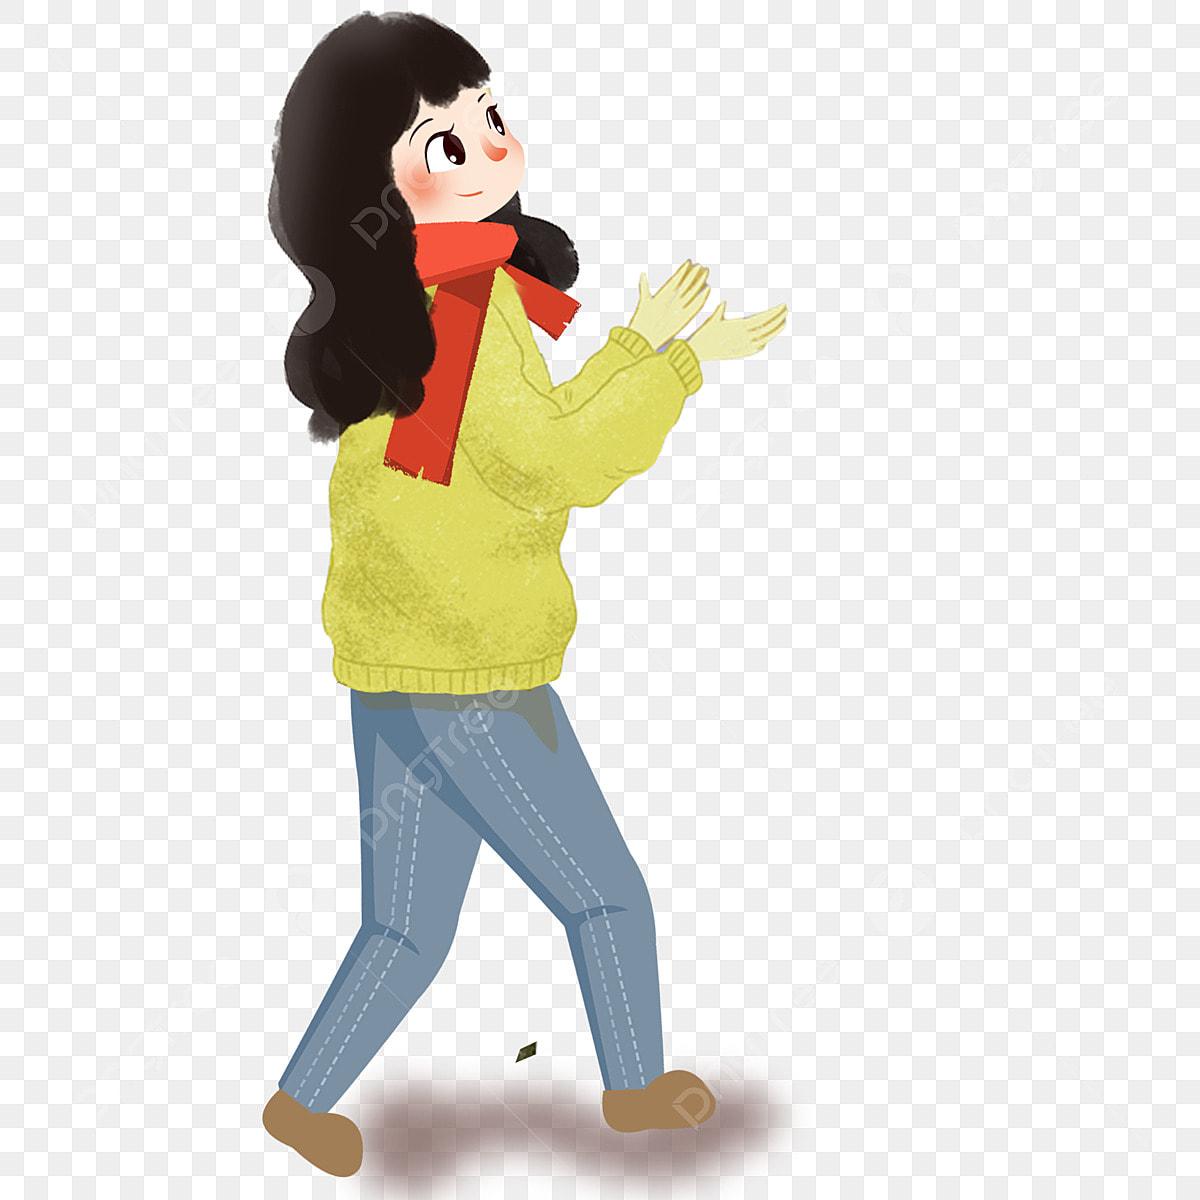 Alone Cartoon Girl cartoon cute girl walking alone, cartoon, cute, girl png